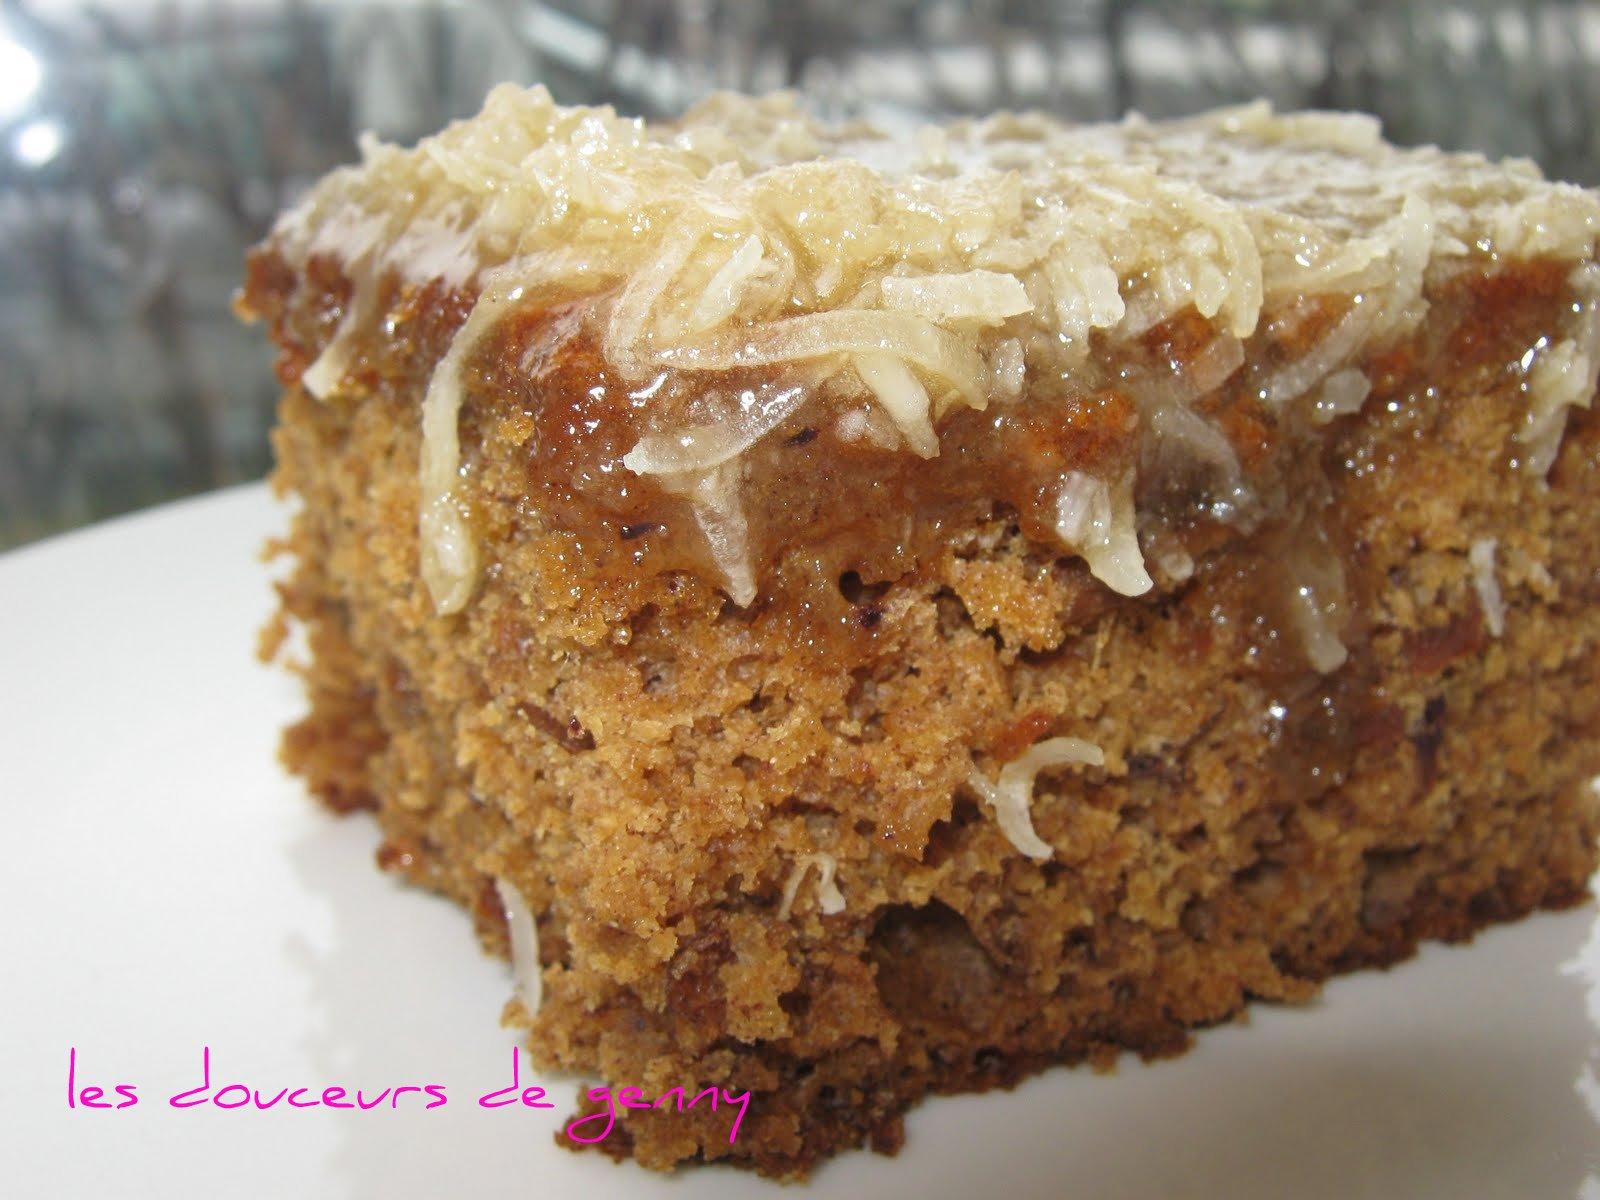 Recette De Cake Au Chocolat Et Caramel Au Berre Sak Ef Bf Bd